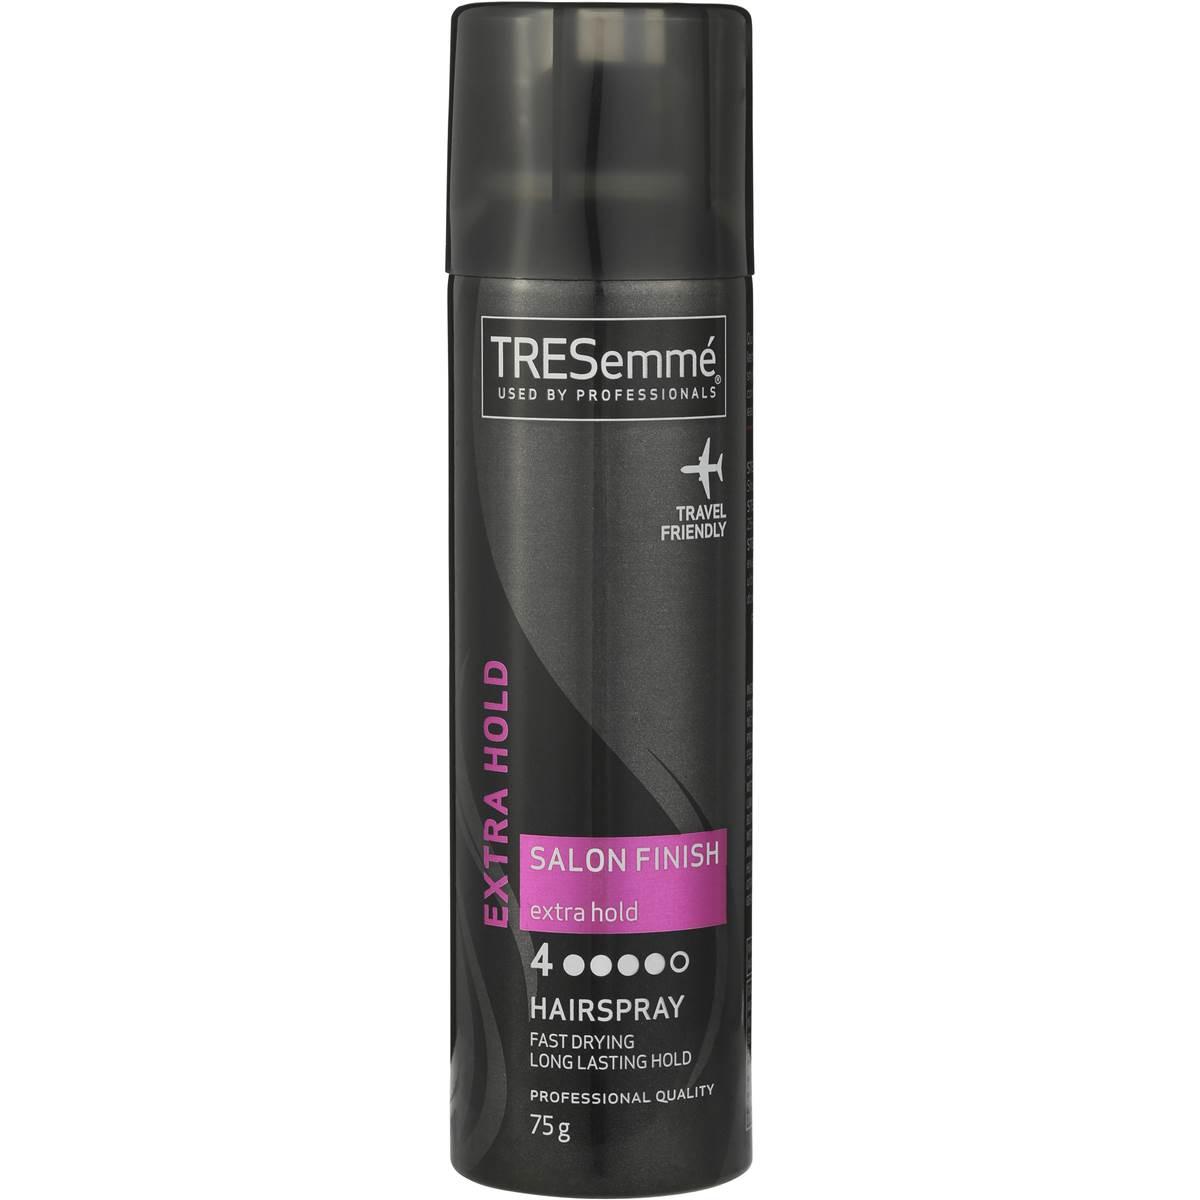 tresemme hair spray extra hold 75g woolworths